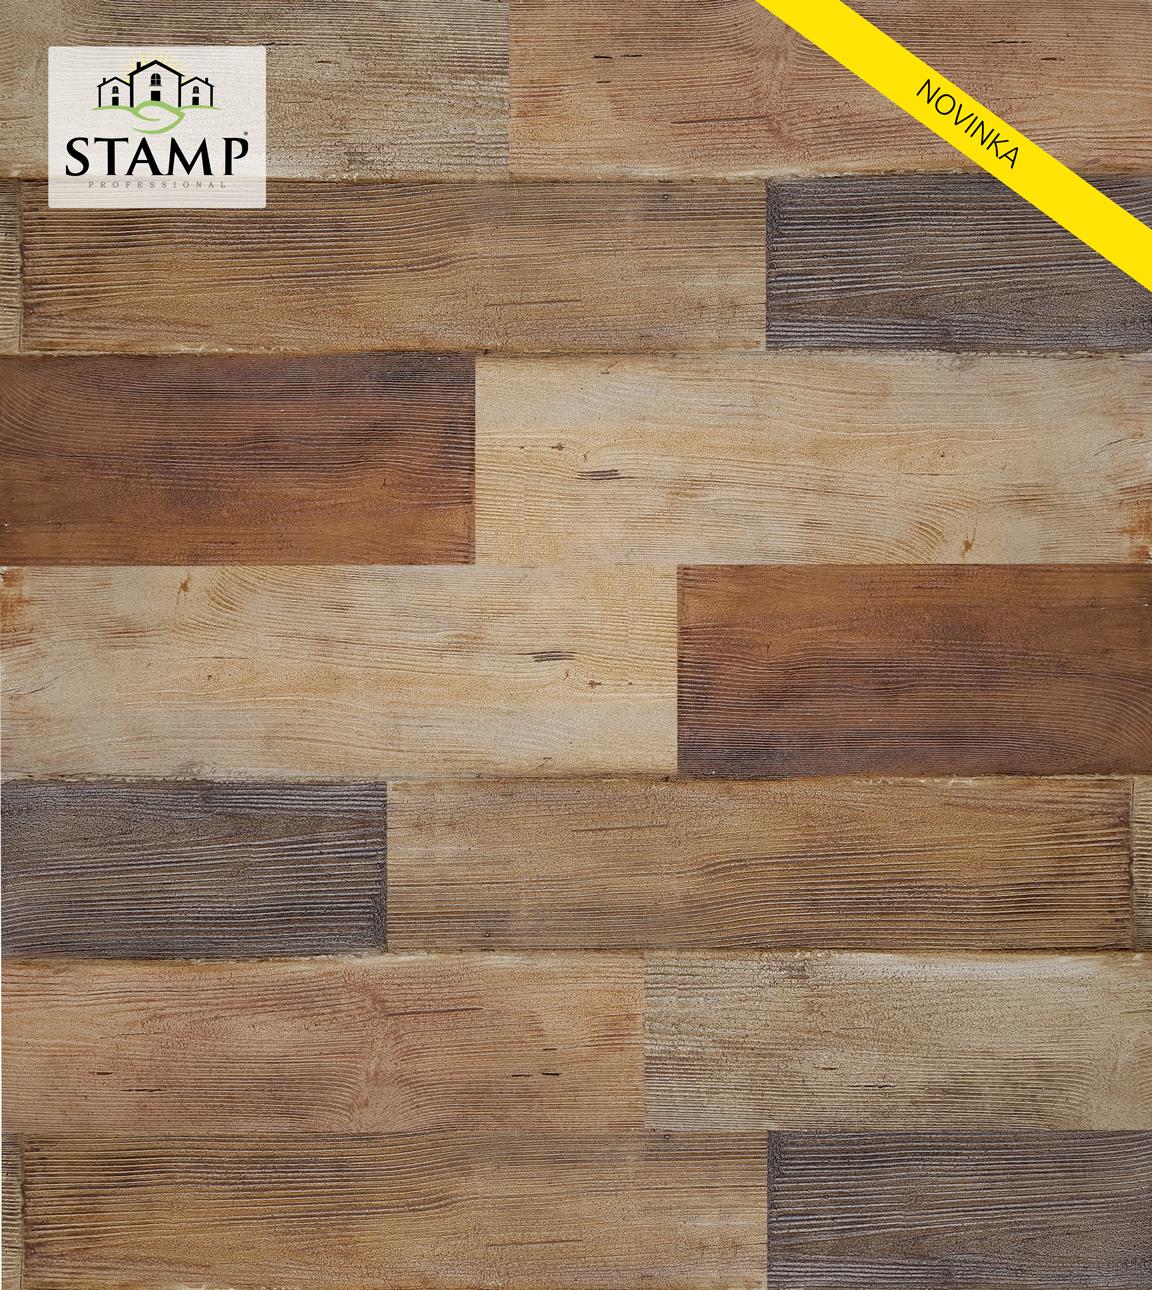 Stamp-Drevený obklad-s-logom-zmenseny-+-NOVINKA-NIZSIA